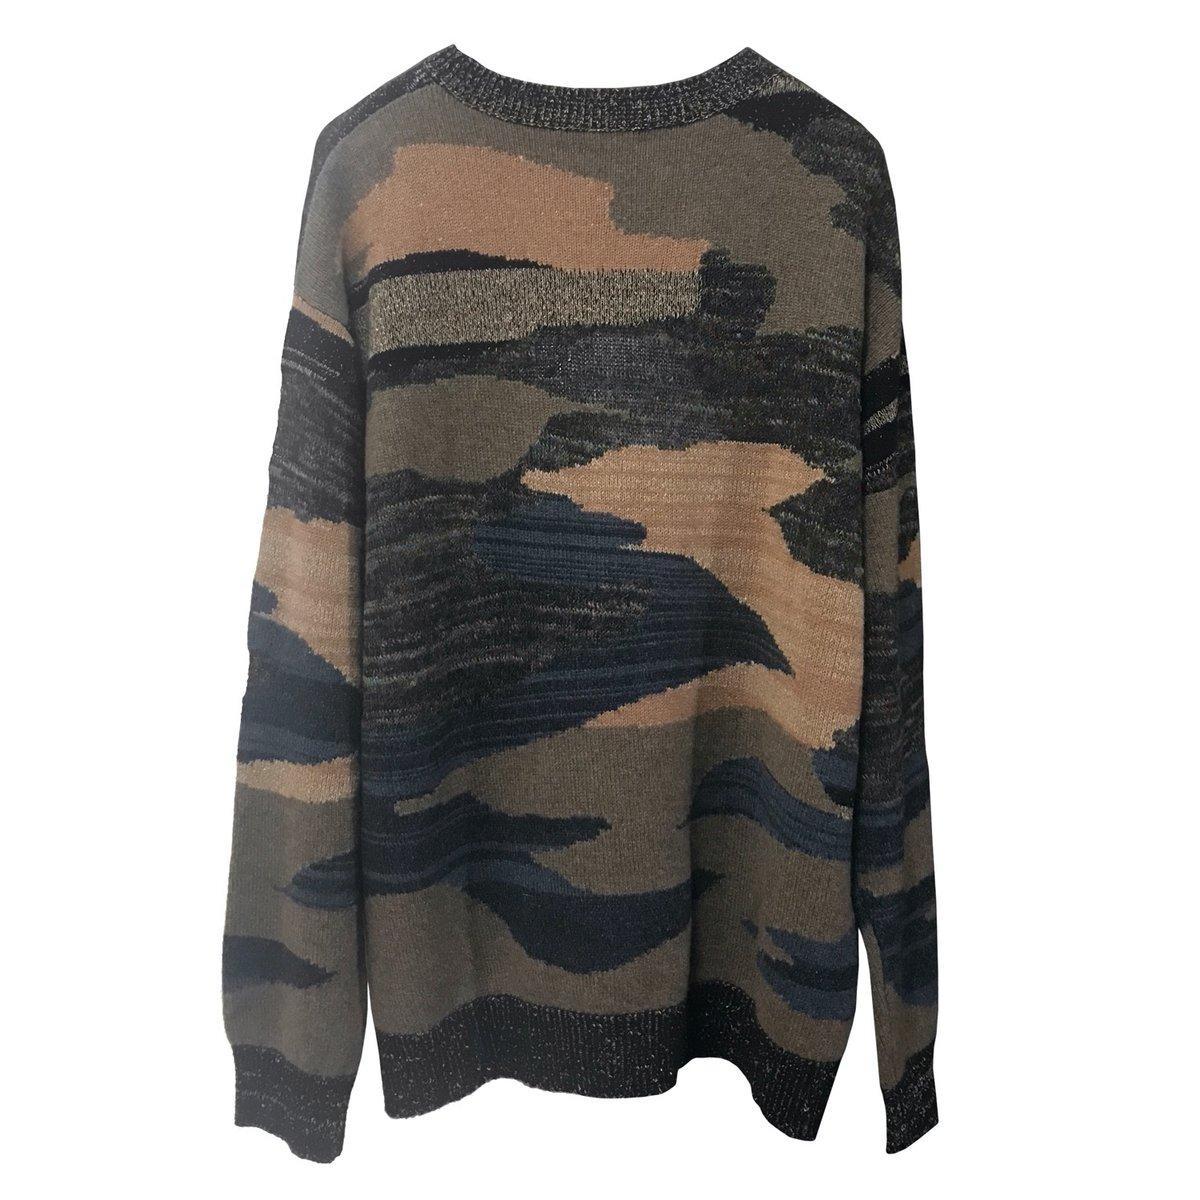 Dries Van Noten Napel Camo Cashmere Sweater b.jpg